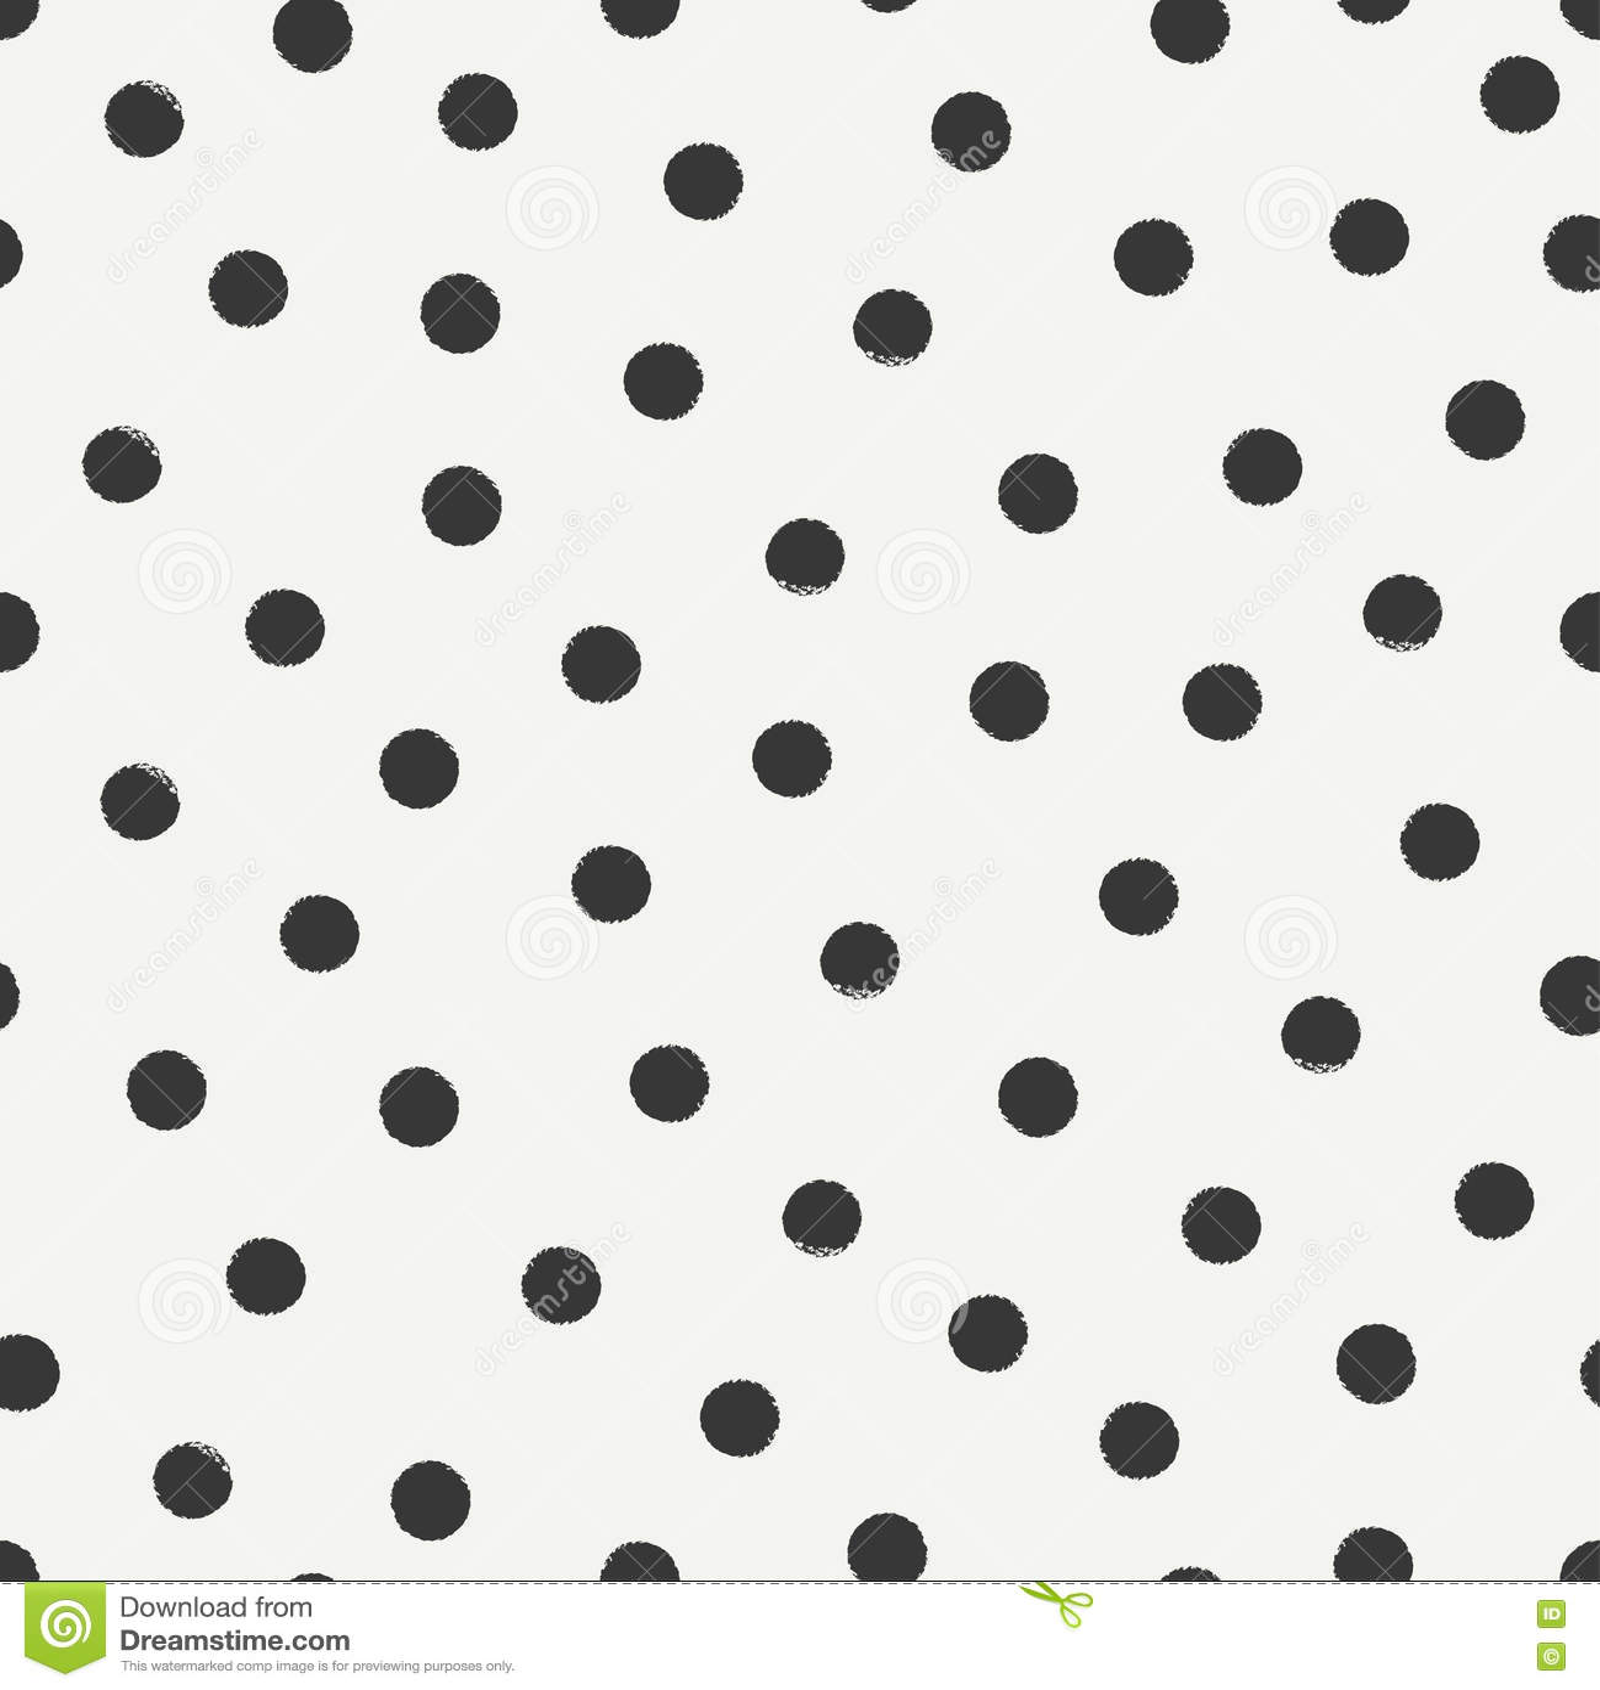 Hand Drawn Geometric Seamless Ink Polka Dot Pattern